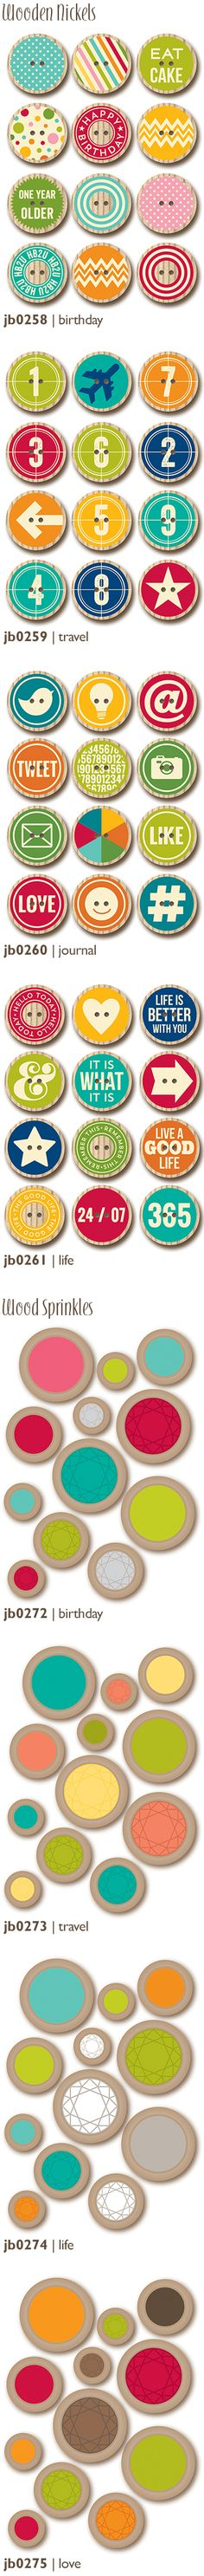 Wood Nickels & Wood Sprinkles! Brand New Jillibean Soup Embellishments from CHA Winter 2014 via Jillibean Soup blog